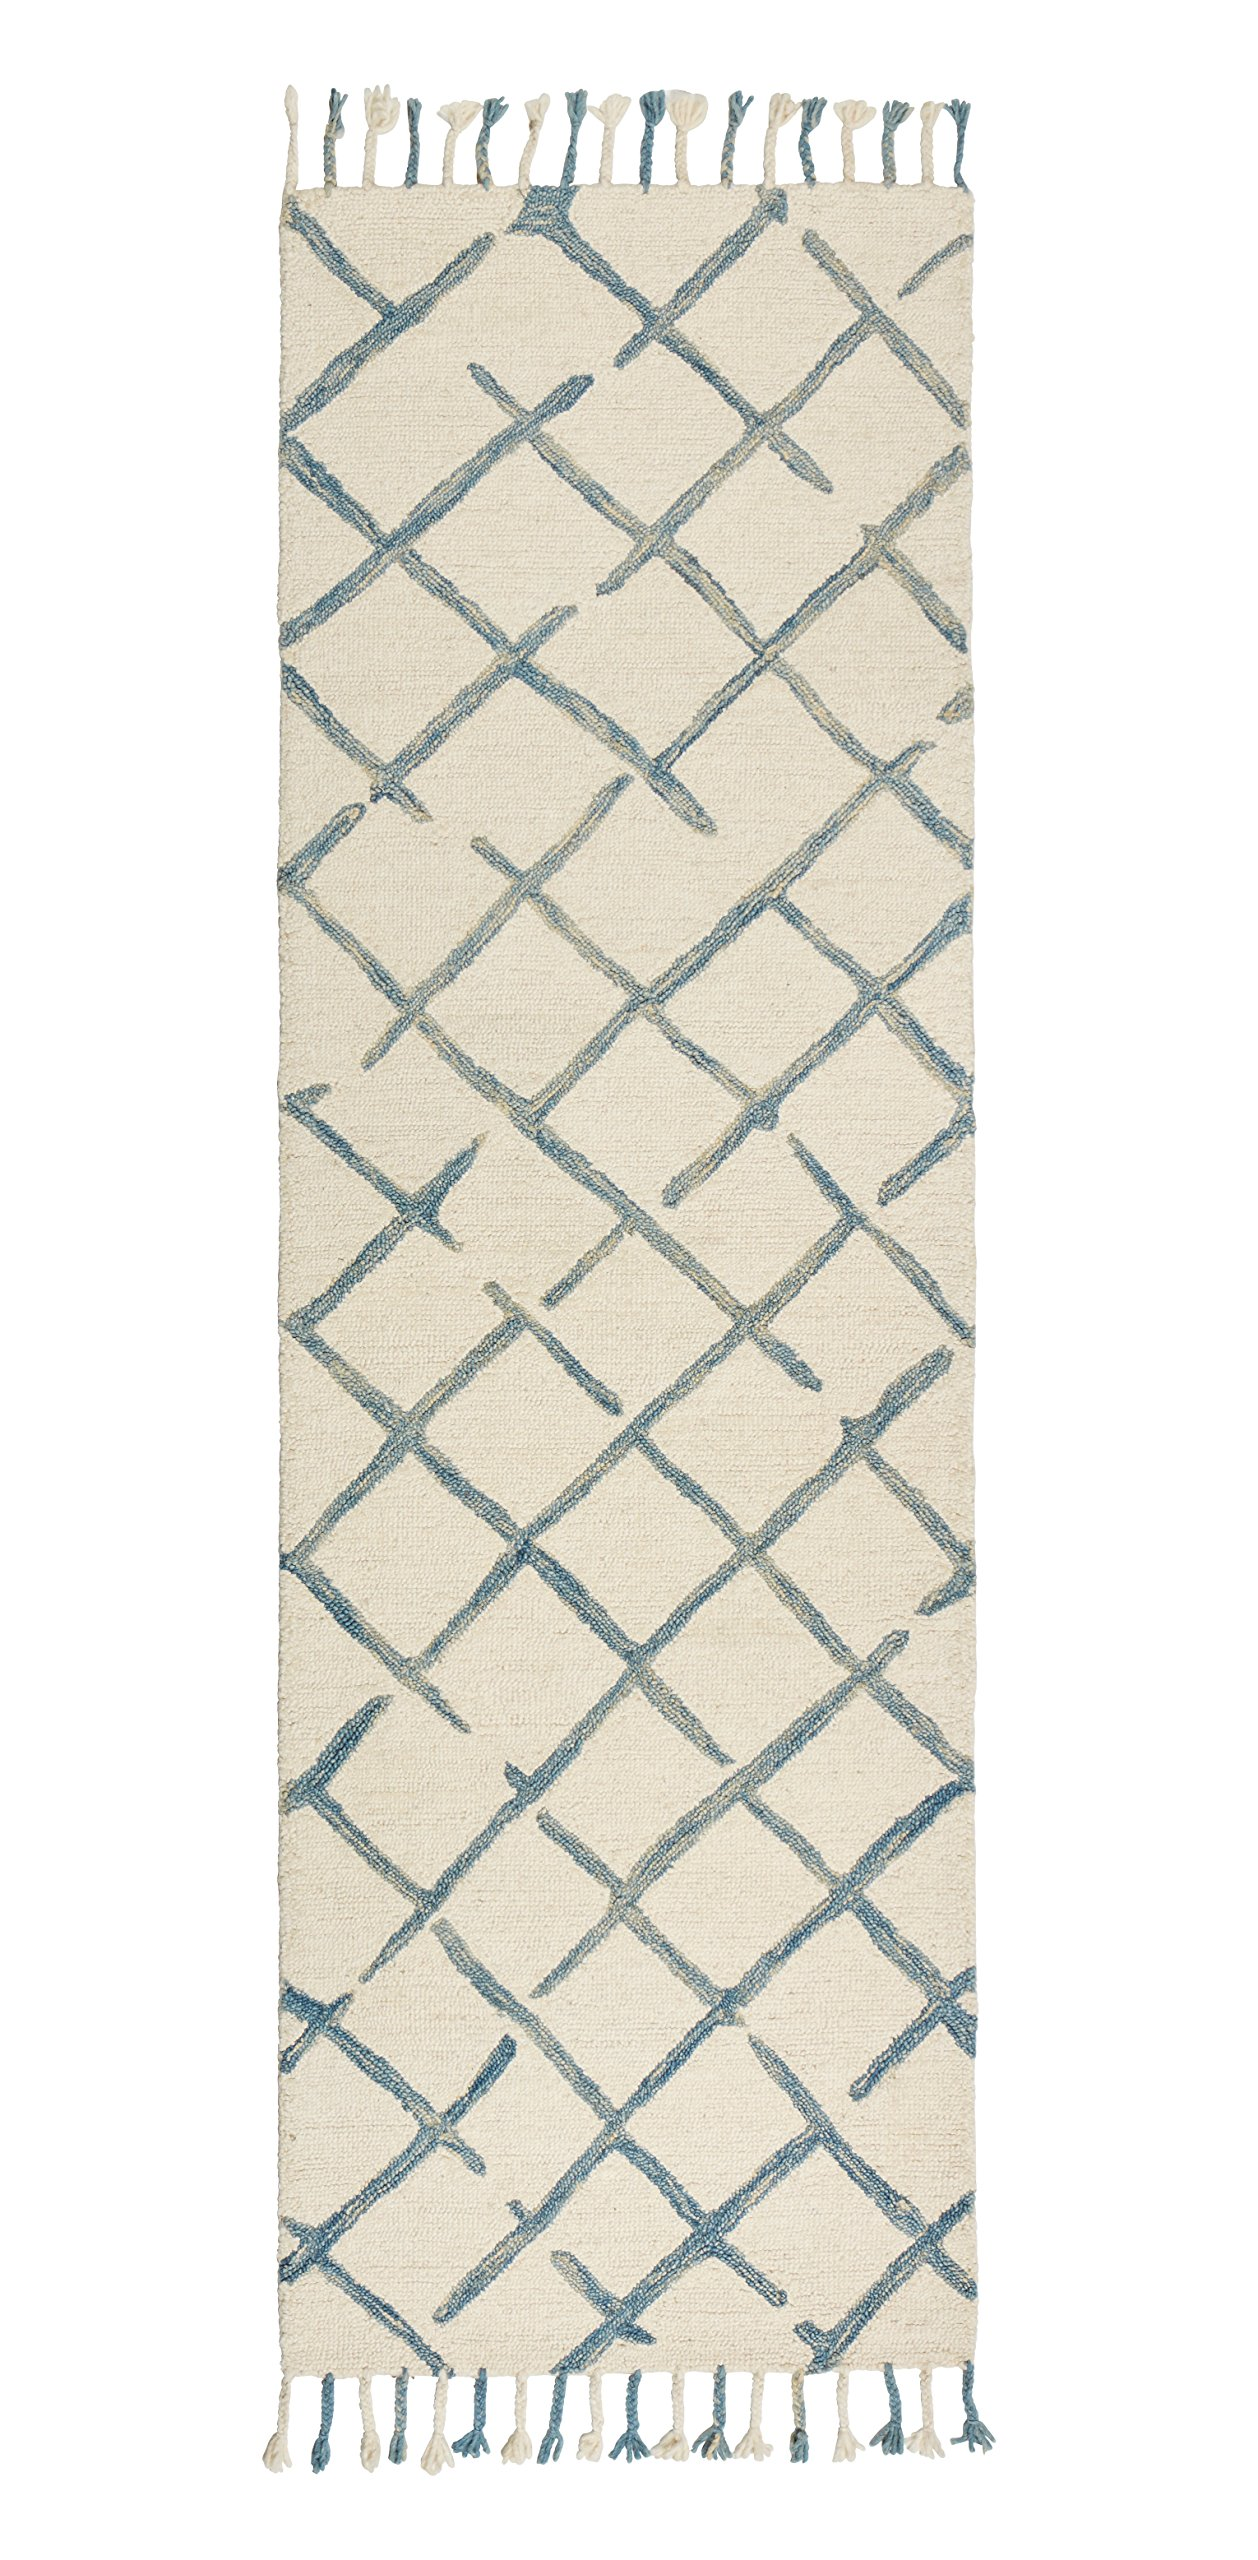 Stone & Beam Transitional Criss-Cross Wool Runner, 2'6 x 8', Blue and White